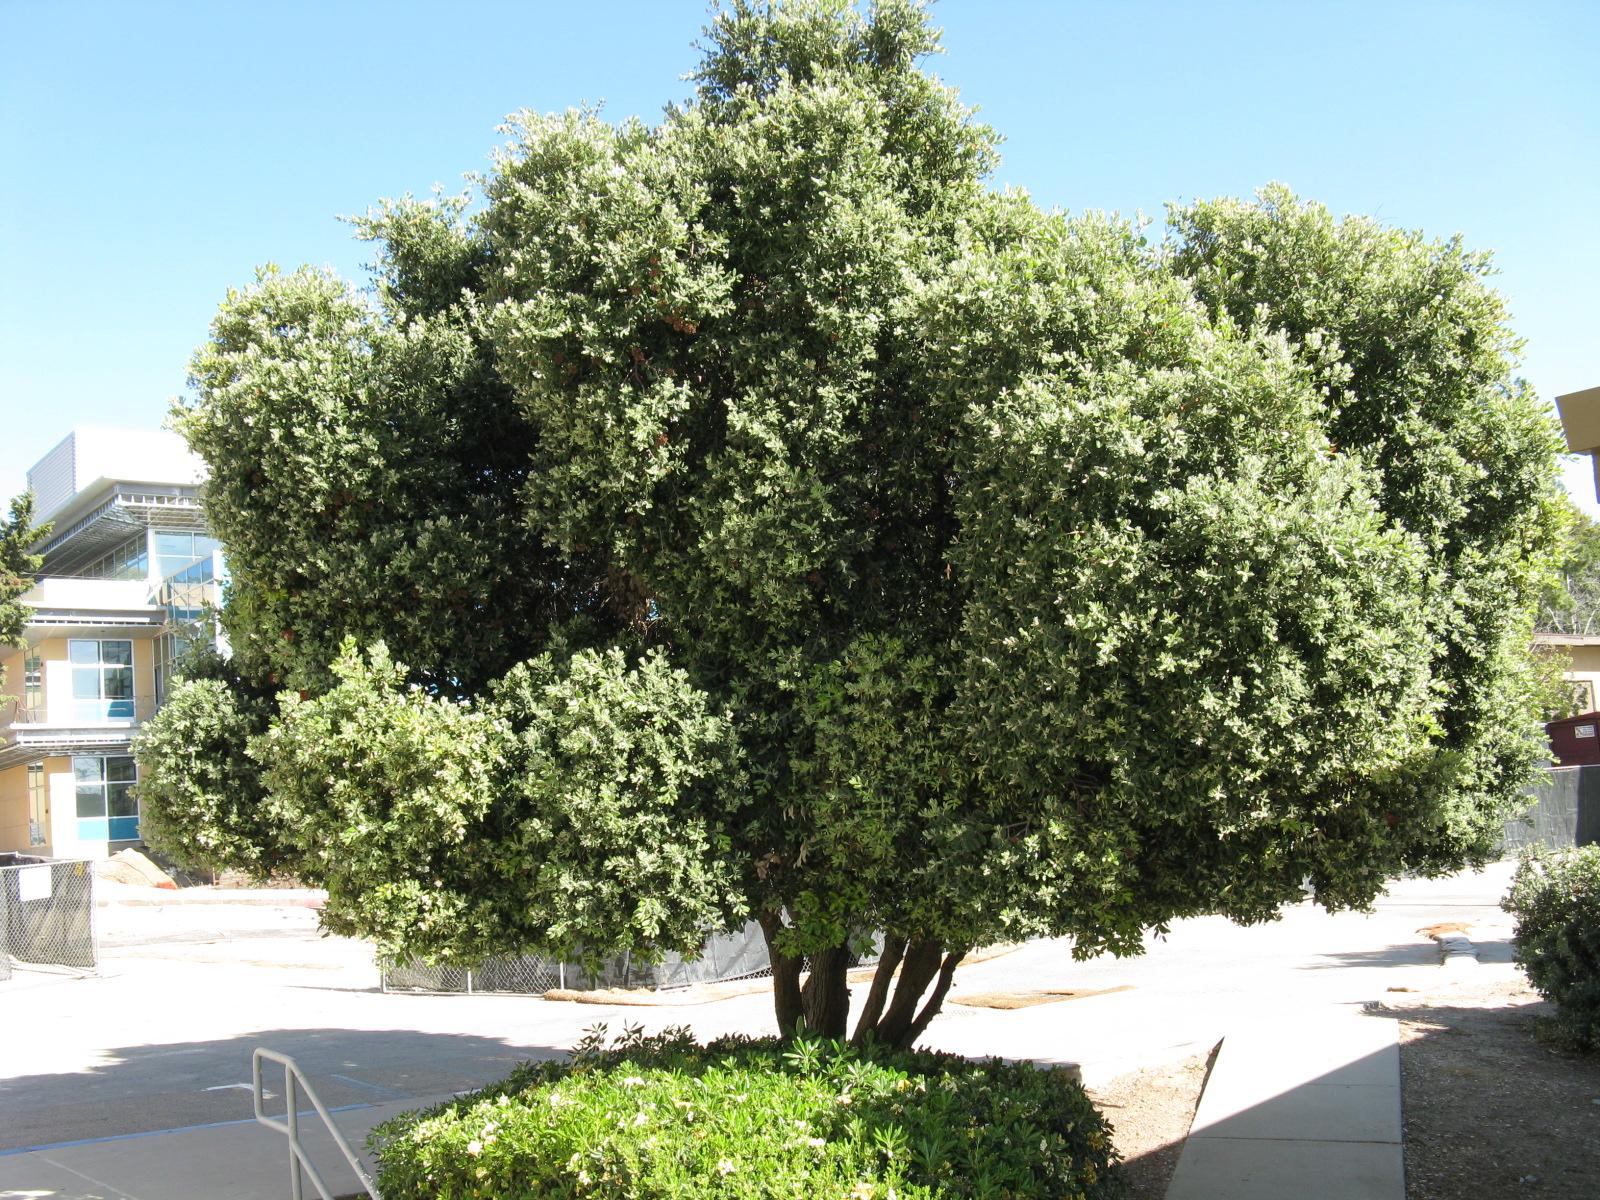 Trees Of Santa Cruz County: Metrosideros Excelsa